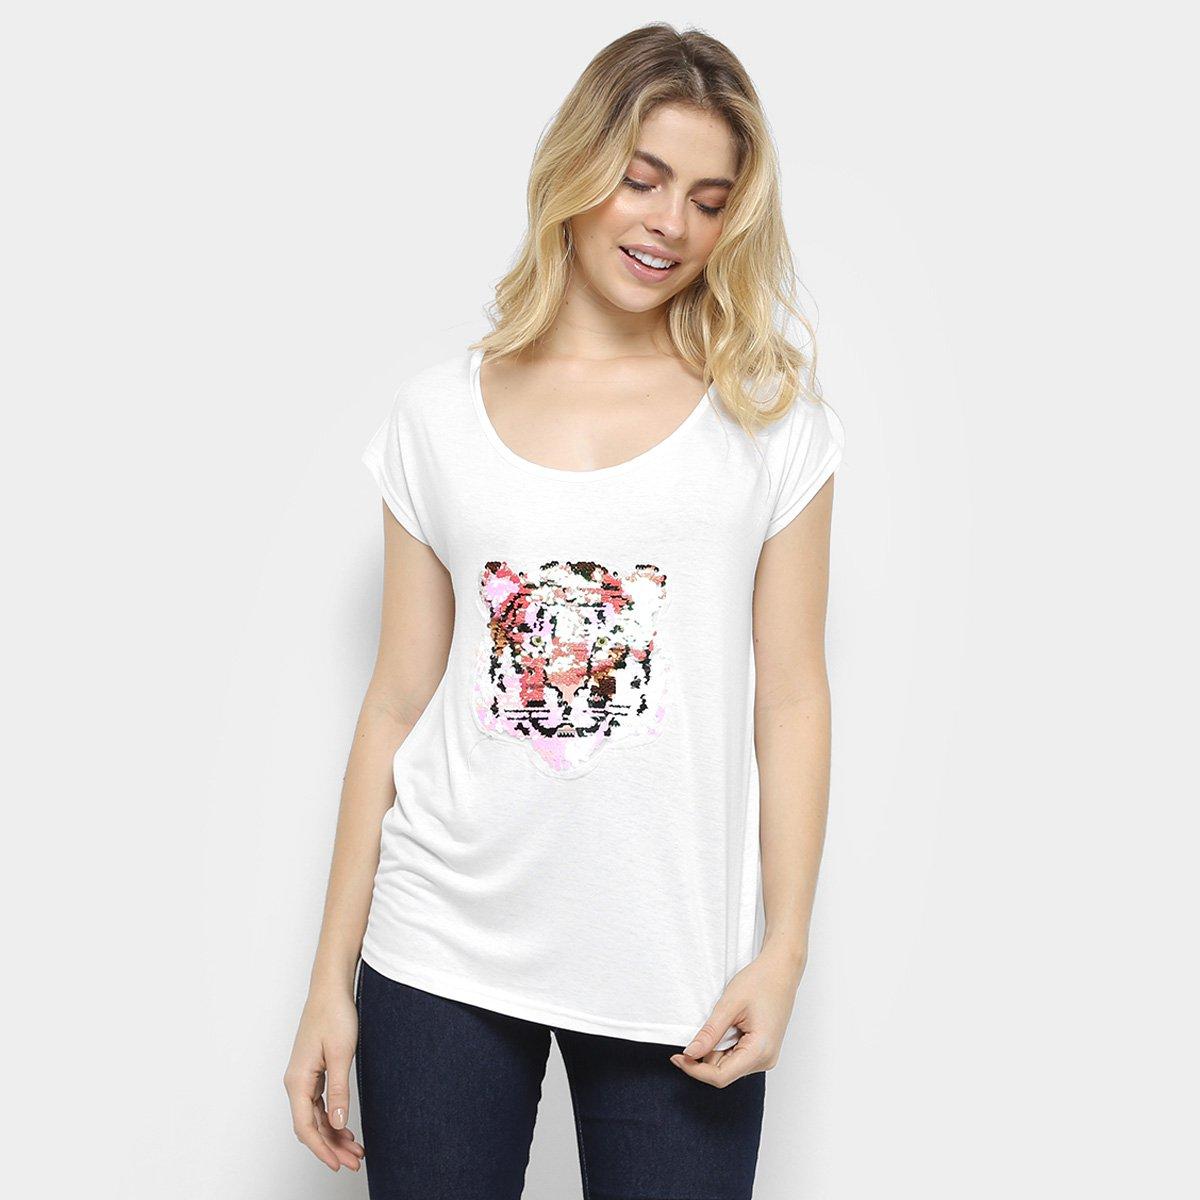 Blusa Holin Stone Tigre Feminina f6c20174ee9